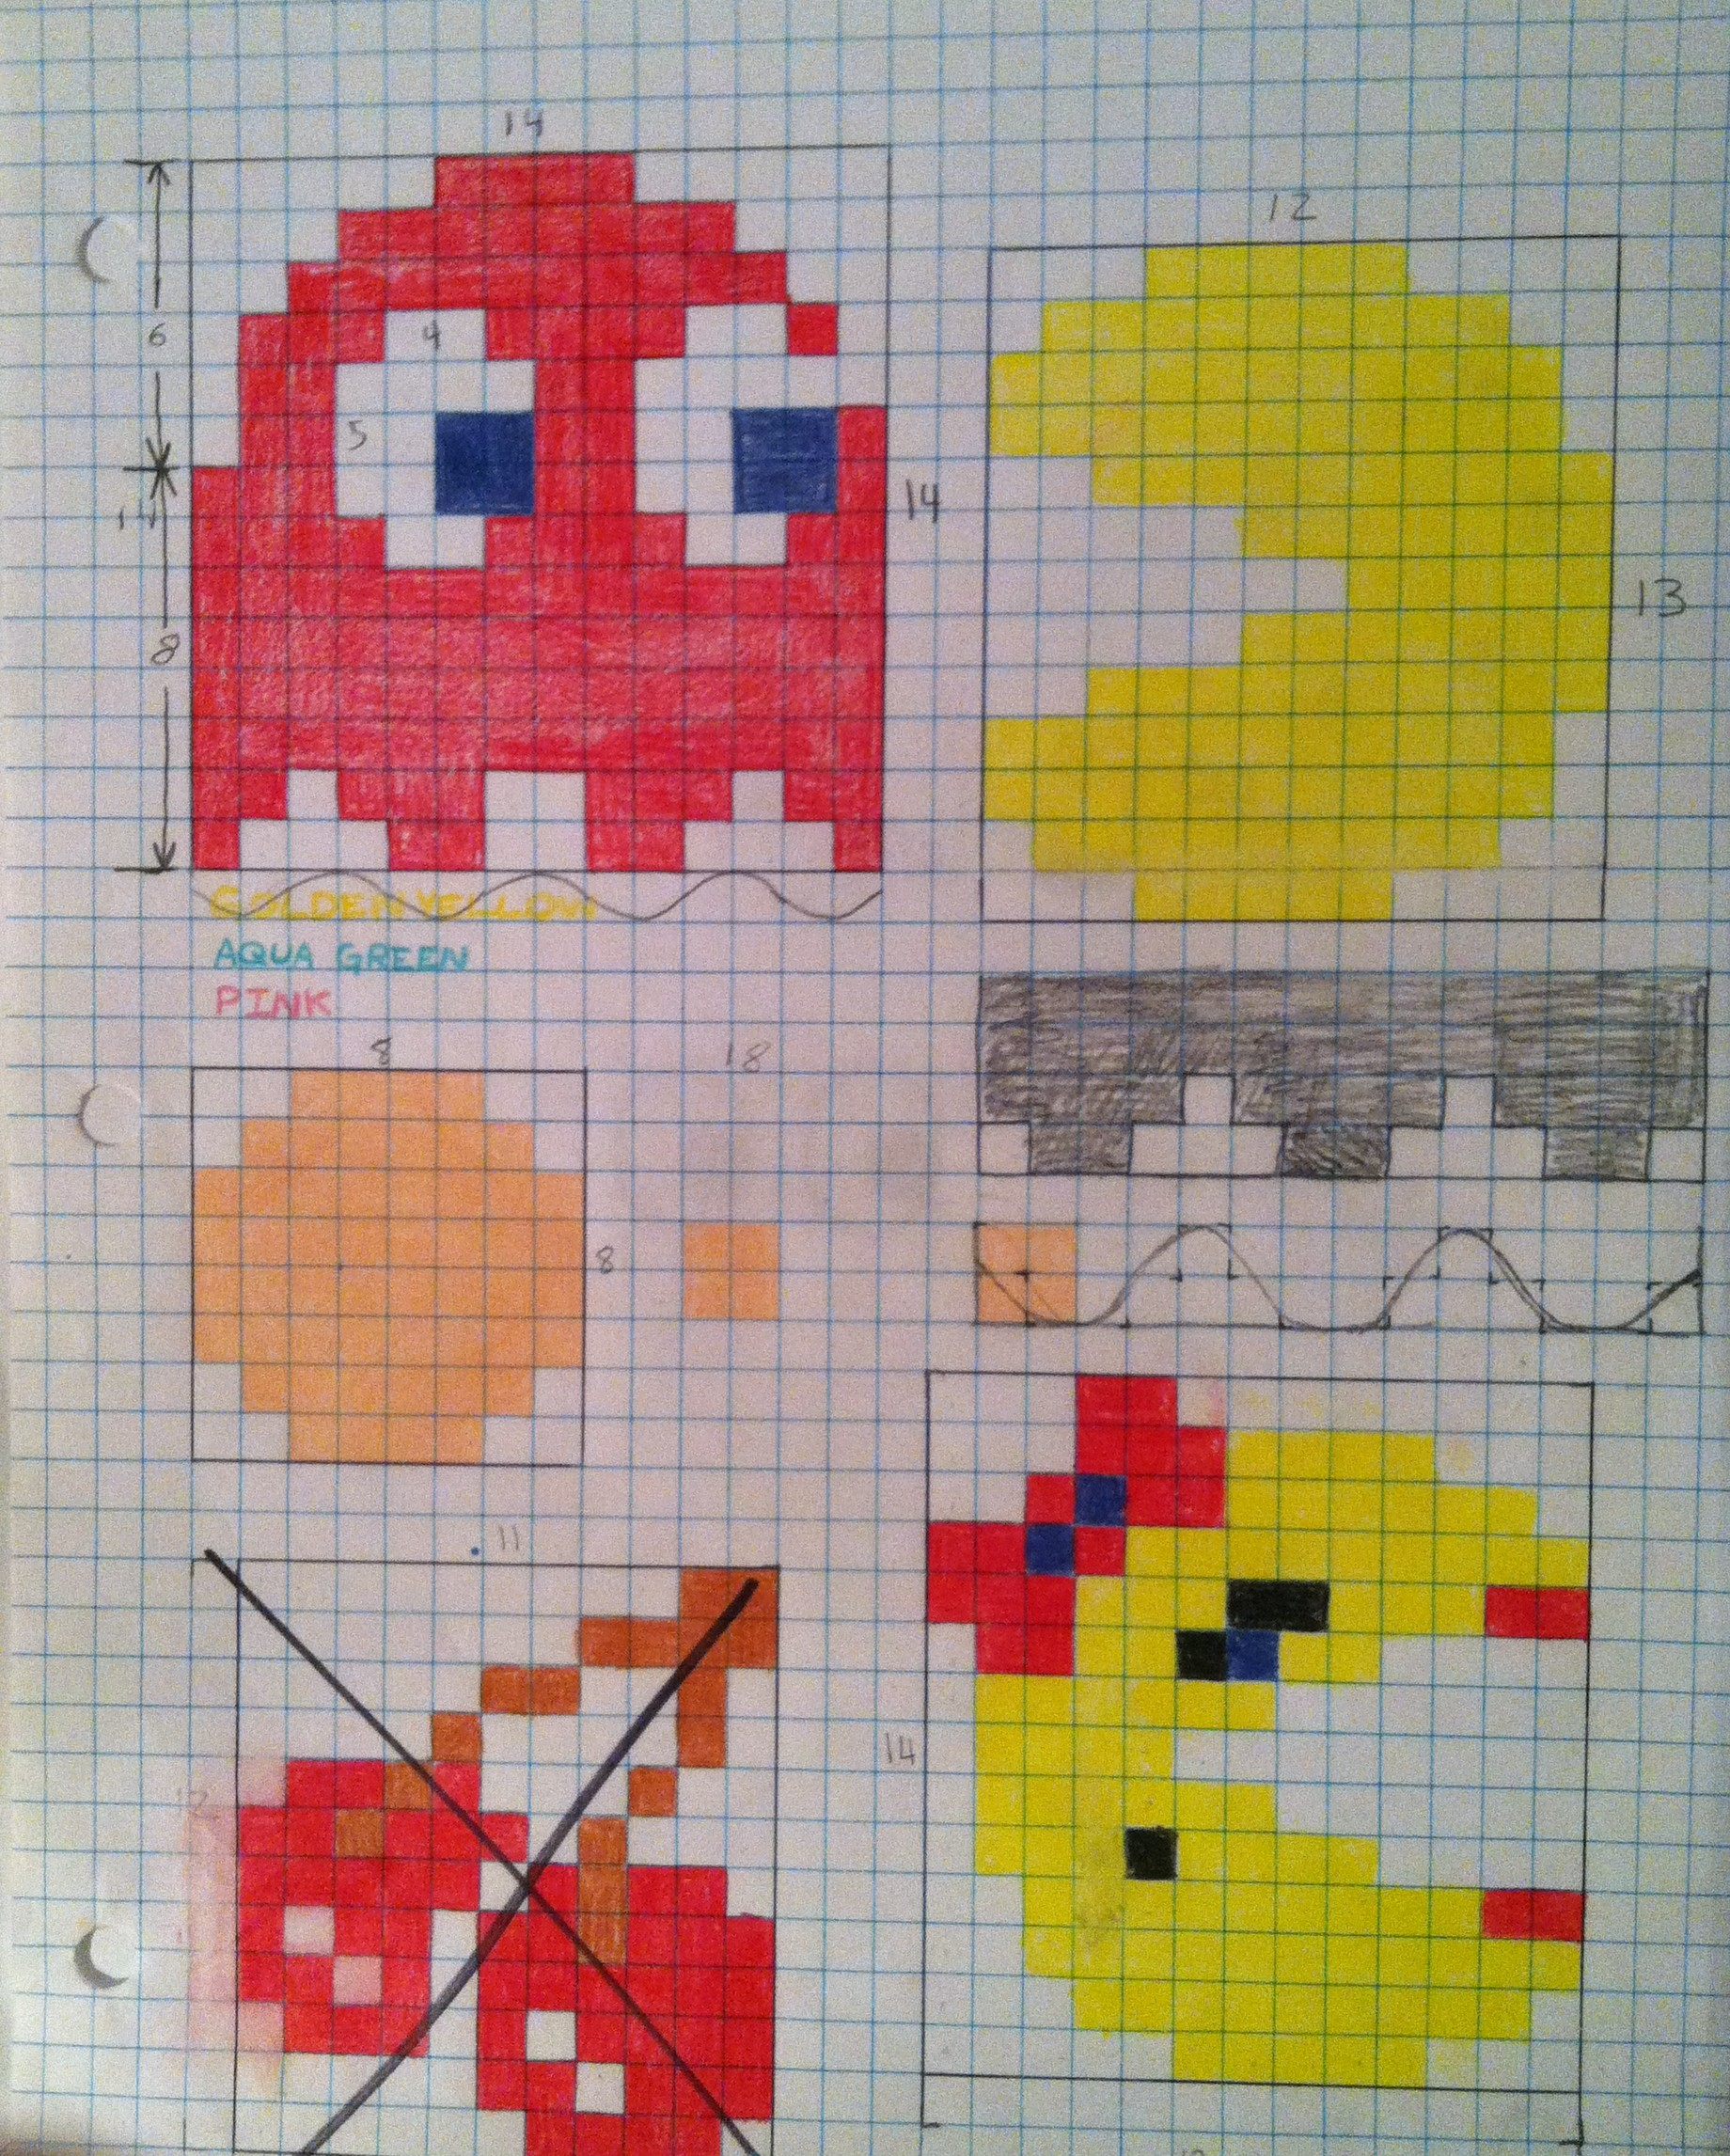 1840x2293 8 Bit Drawing Jeremy Briddle